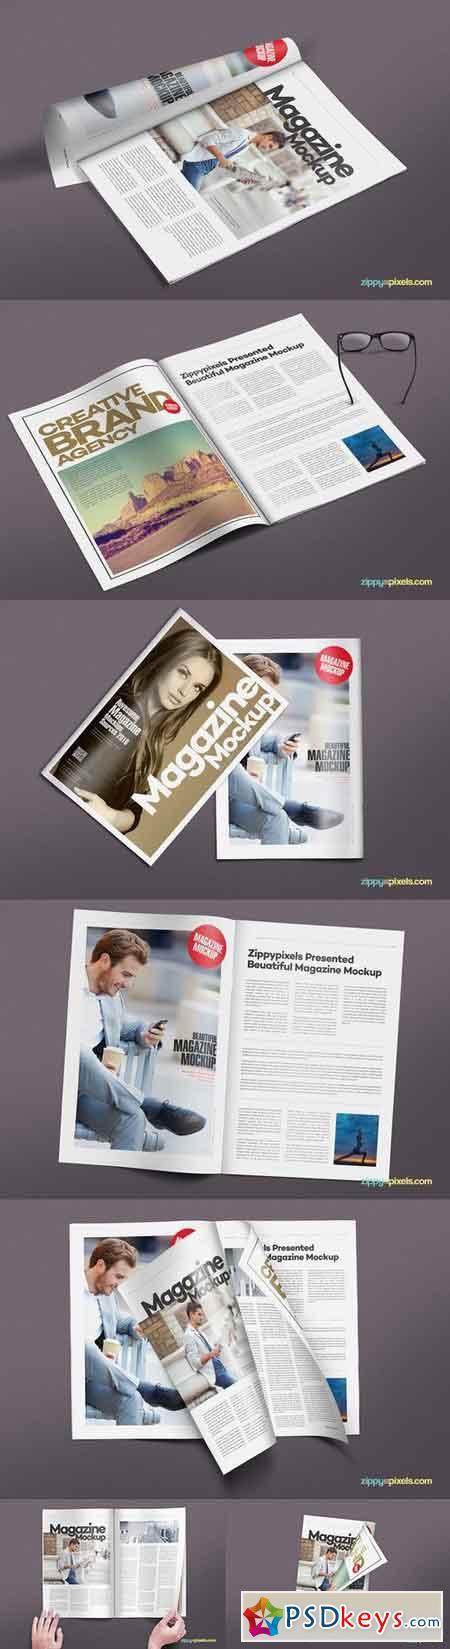 14 Magazine Mockups Vol. 7 561288